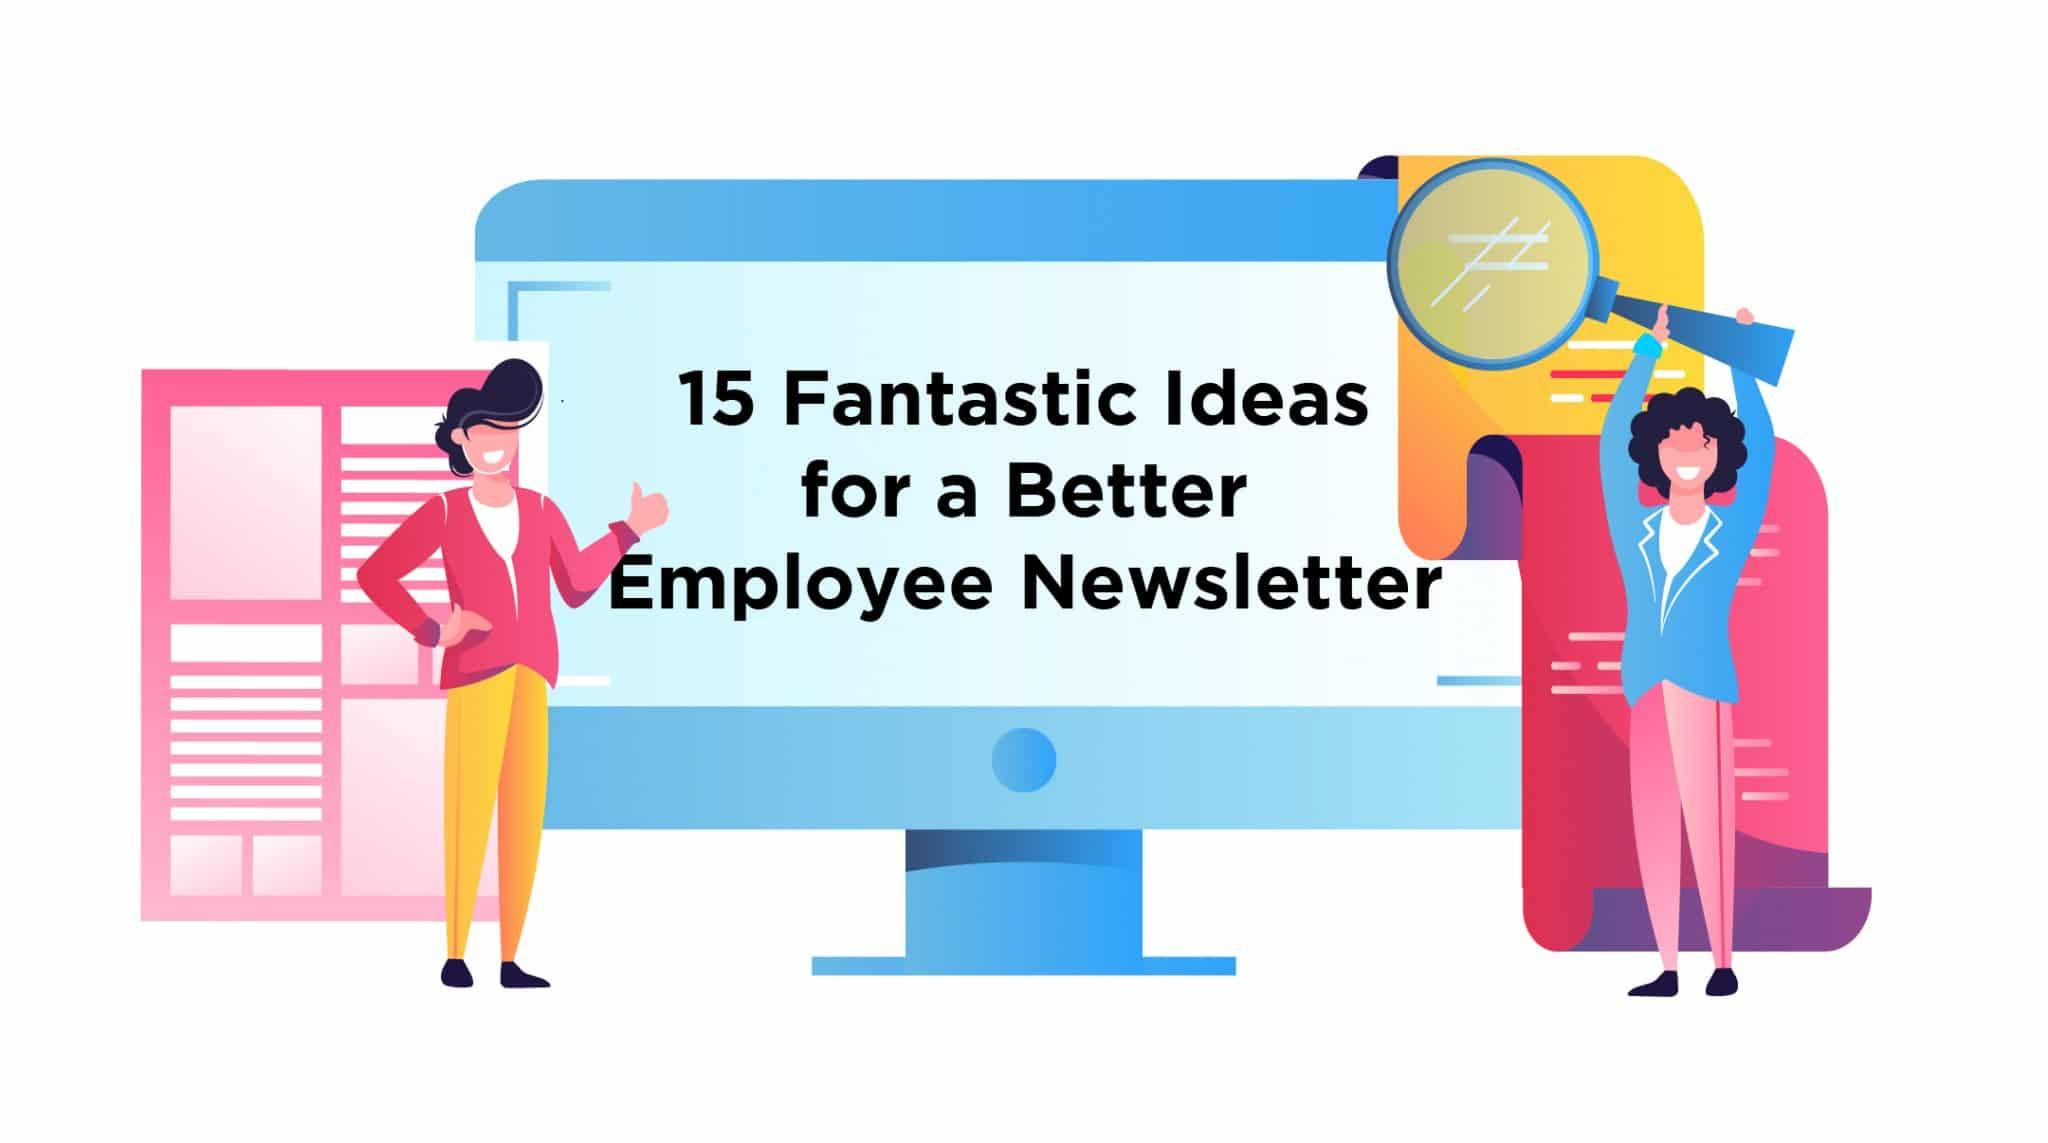 15 ideas header image